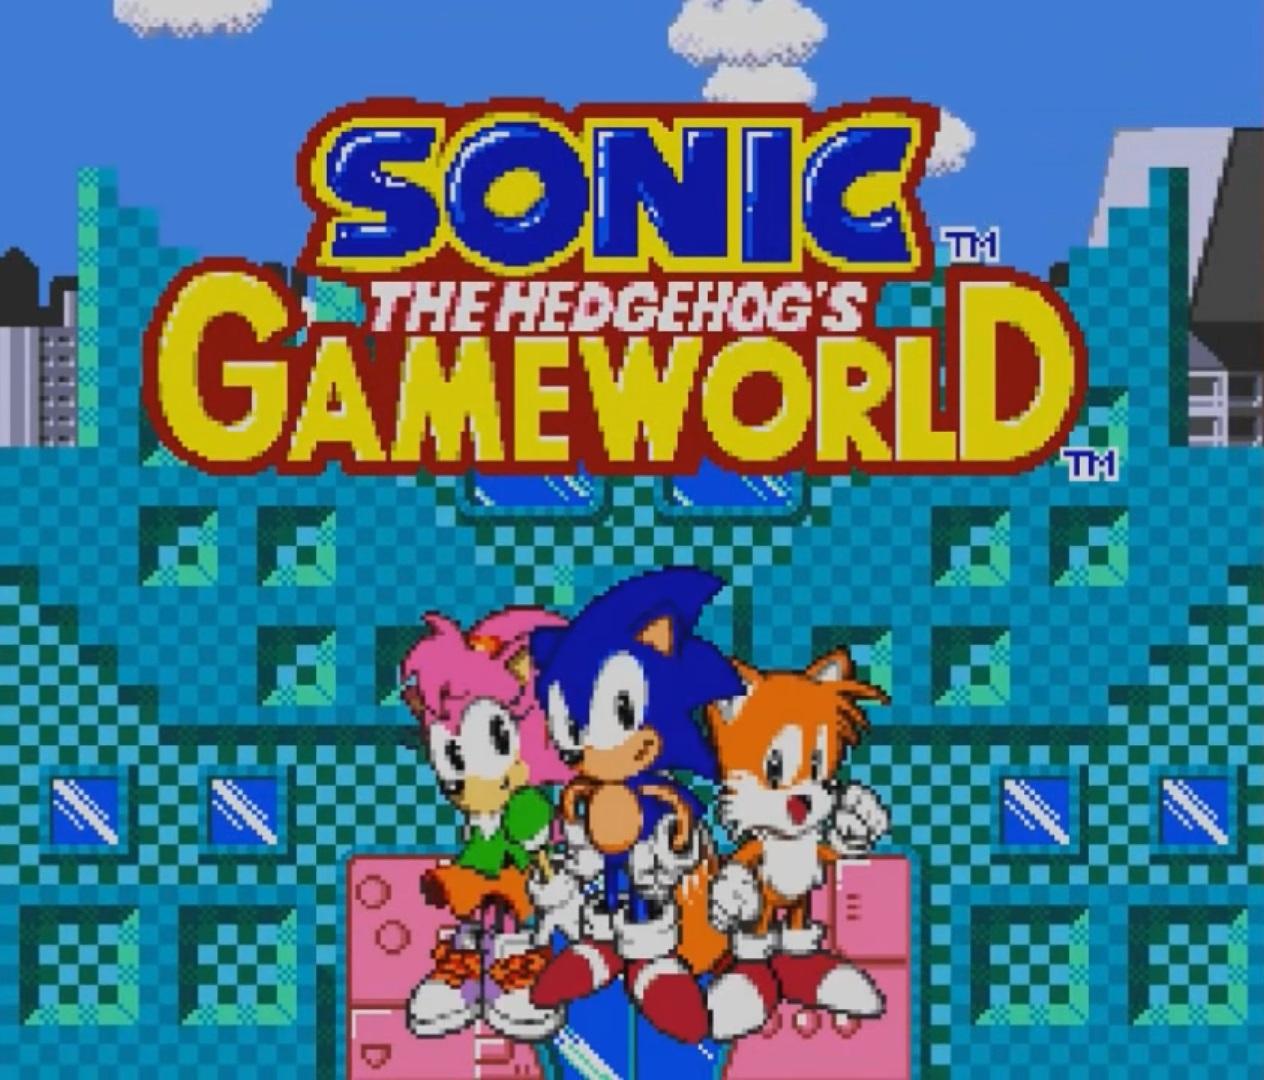 File:Gameworld.jpg